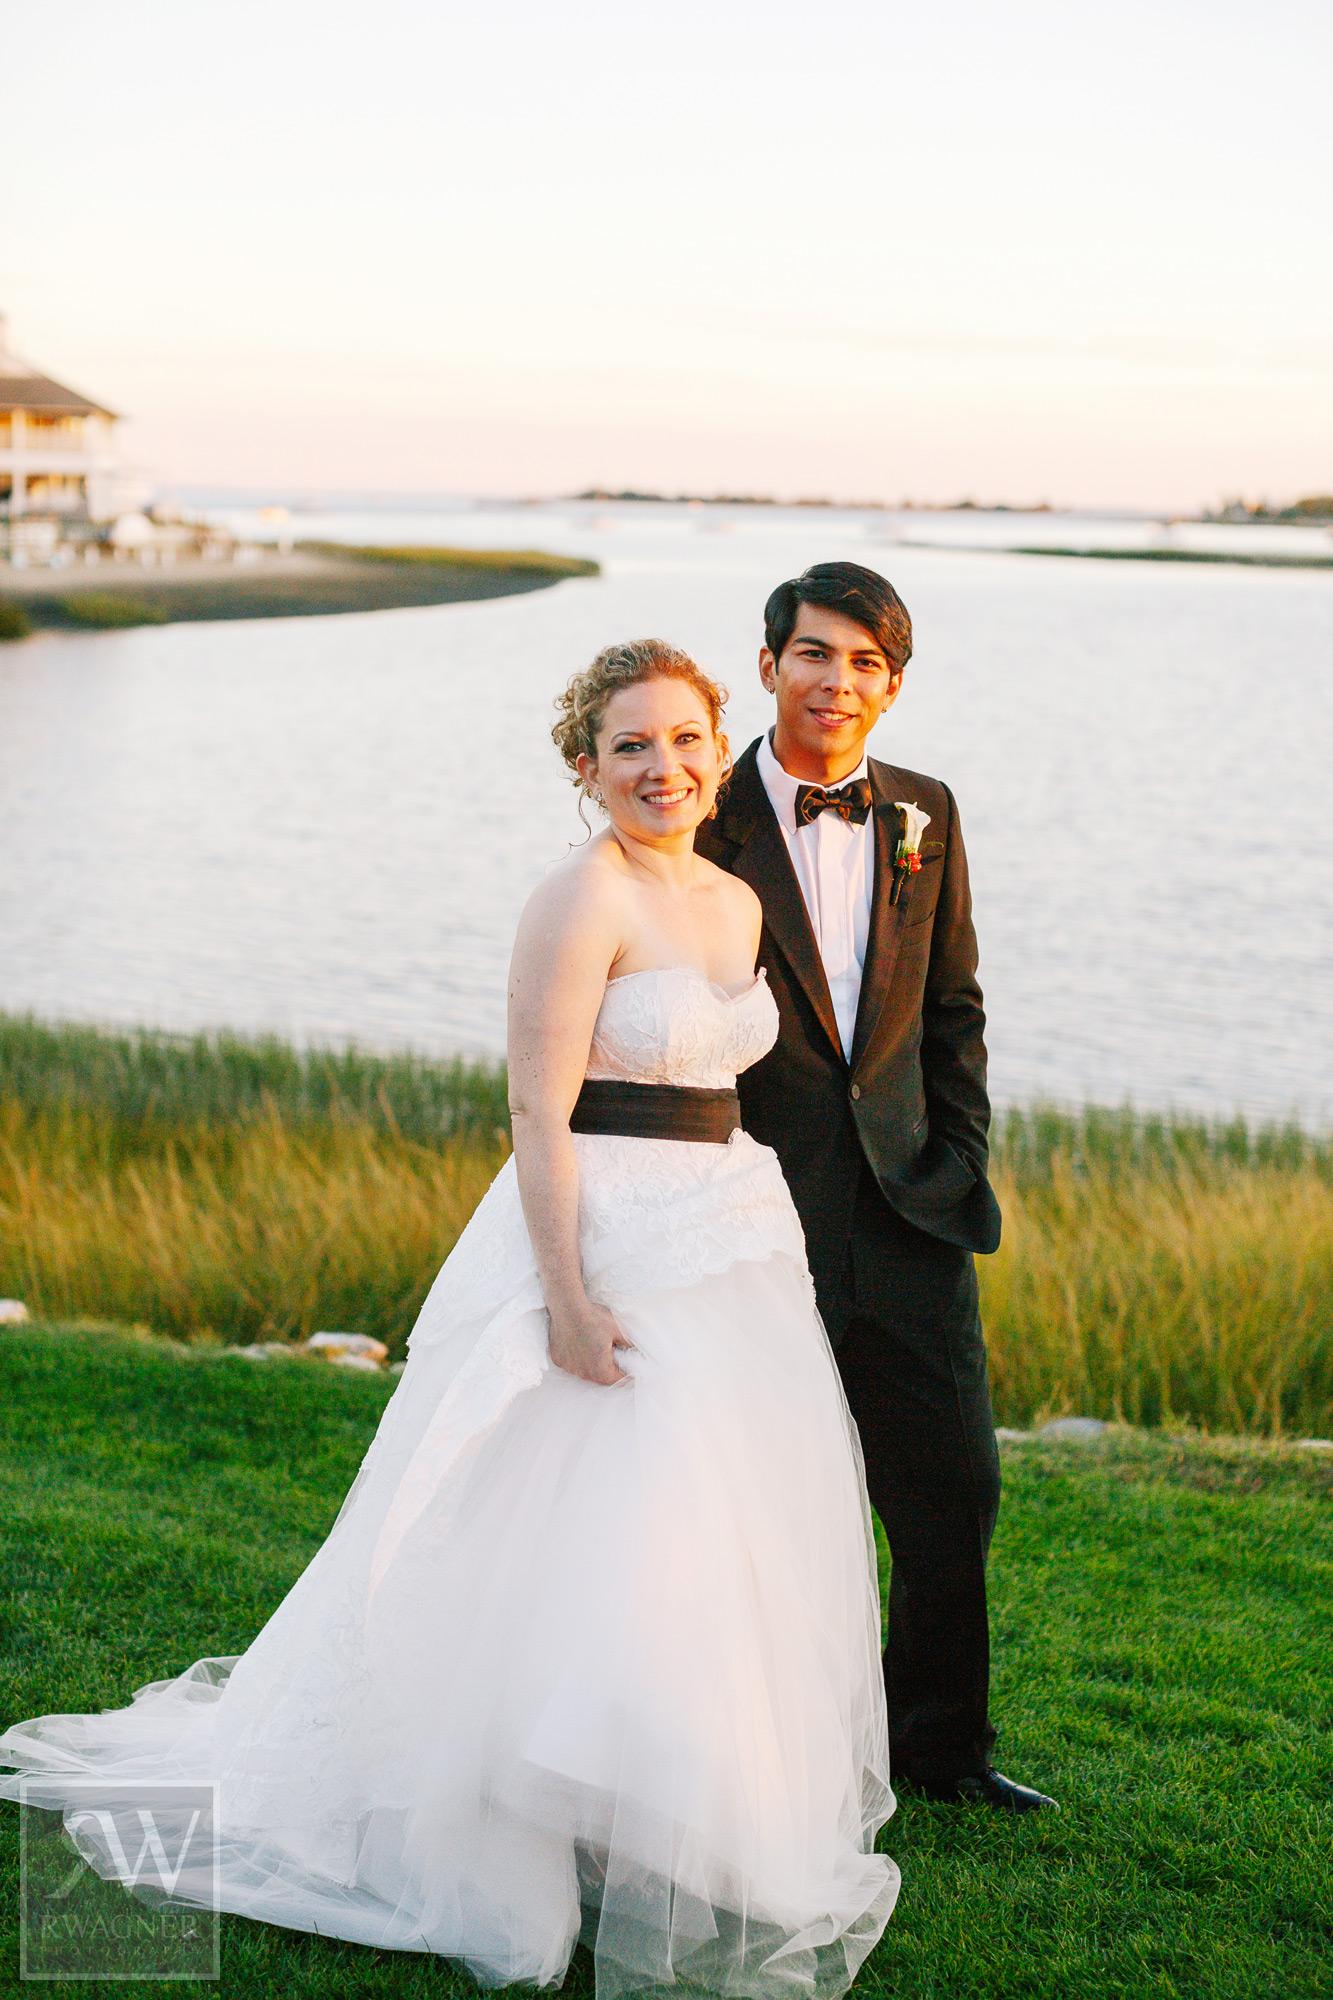 ceci_new_york_luxury_wedding_invitations_couture_red_black_white_real_wedding_dramatic_inn_at_longshore_v286_25.jpg